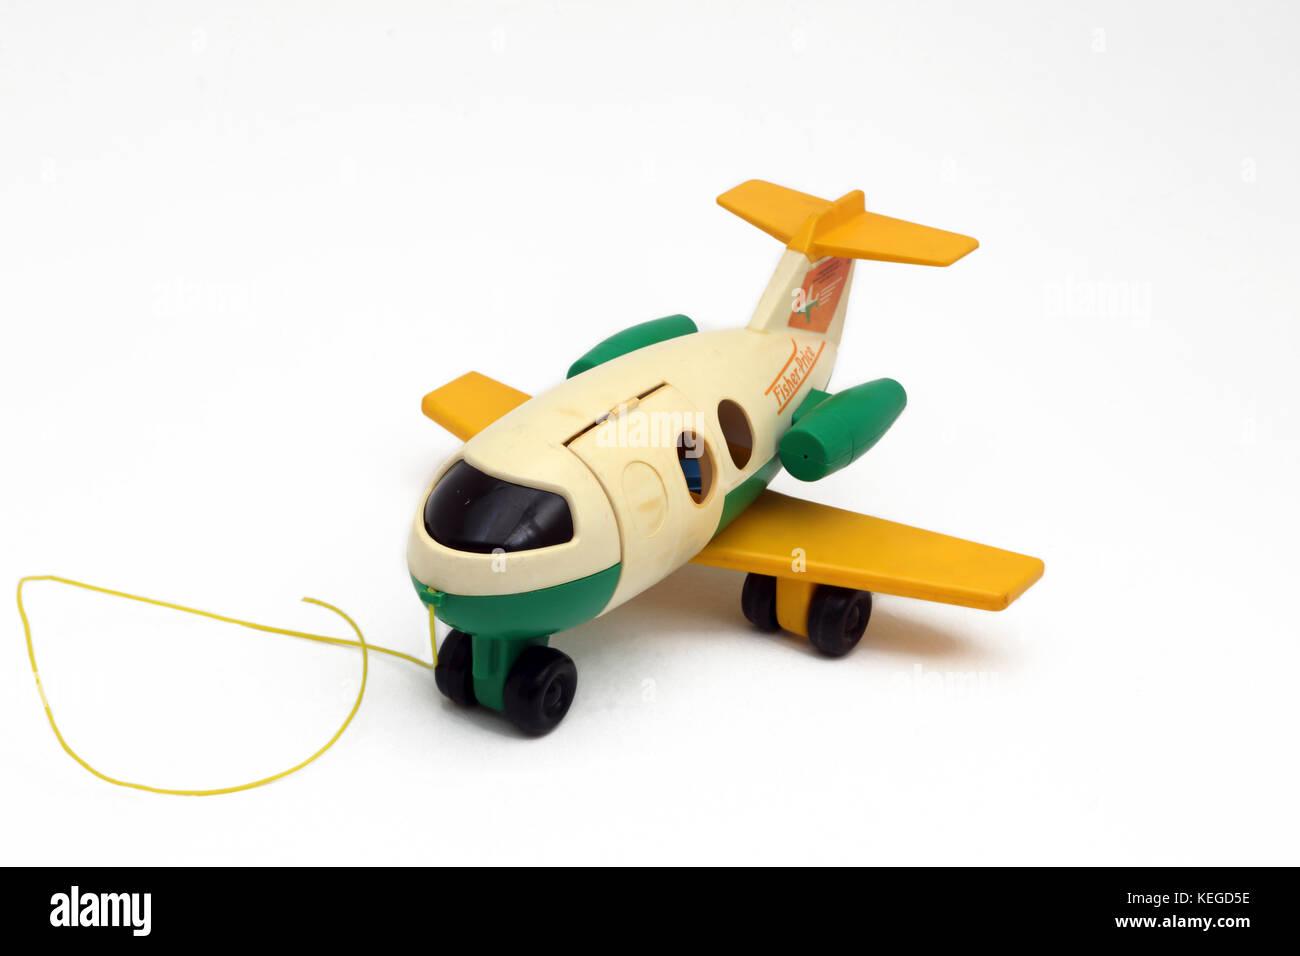 Fisher price stock photos fisher price stock images alamy vintage fisher price pull along aeroplane toy stock image buycottarizona